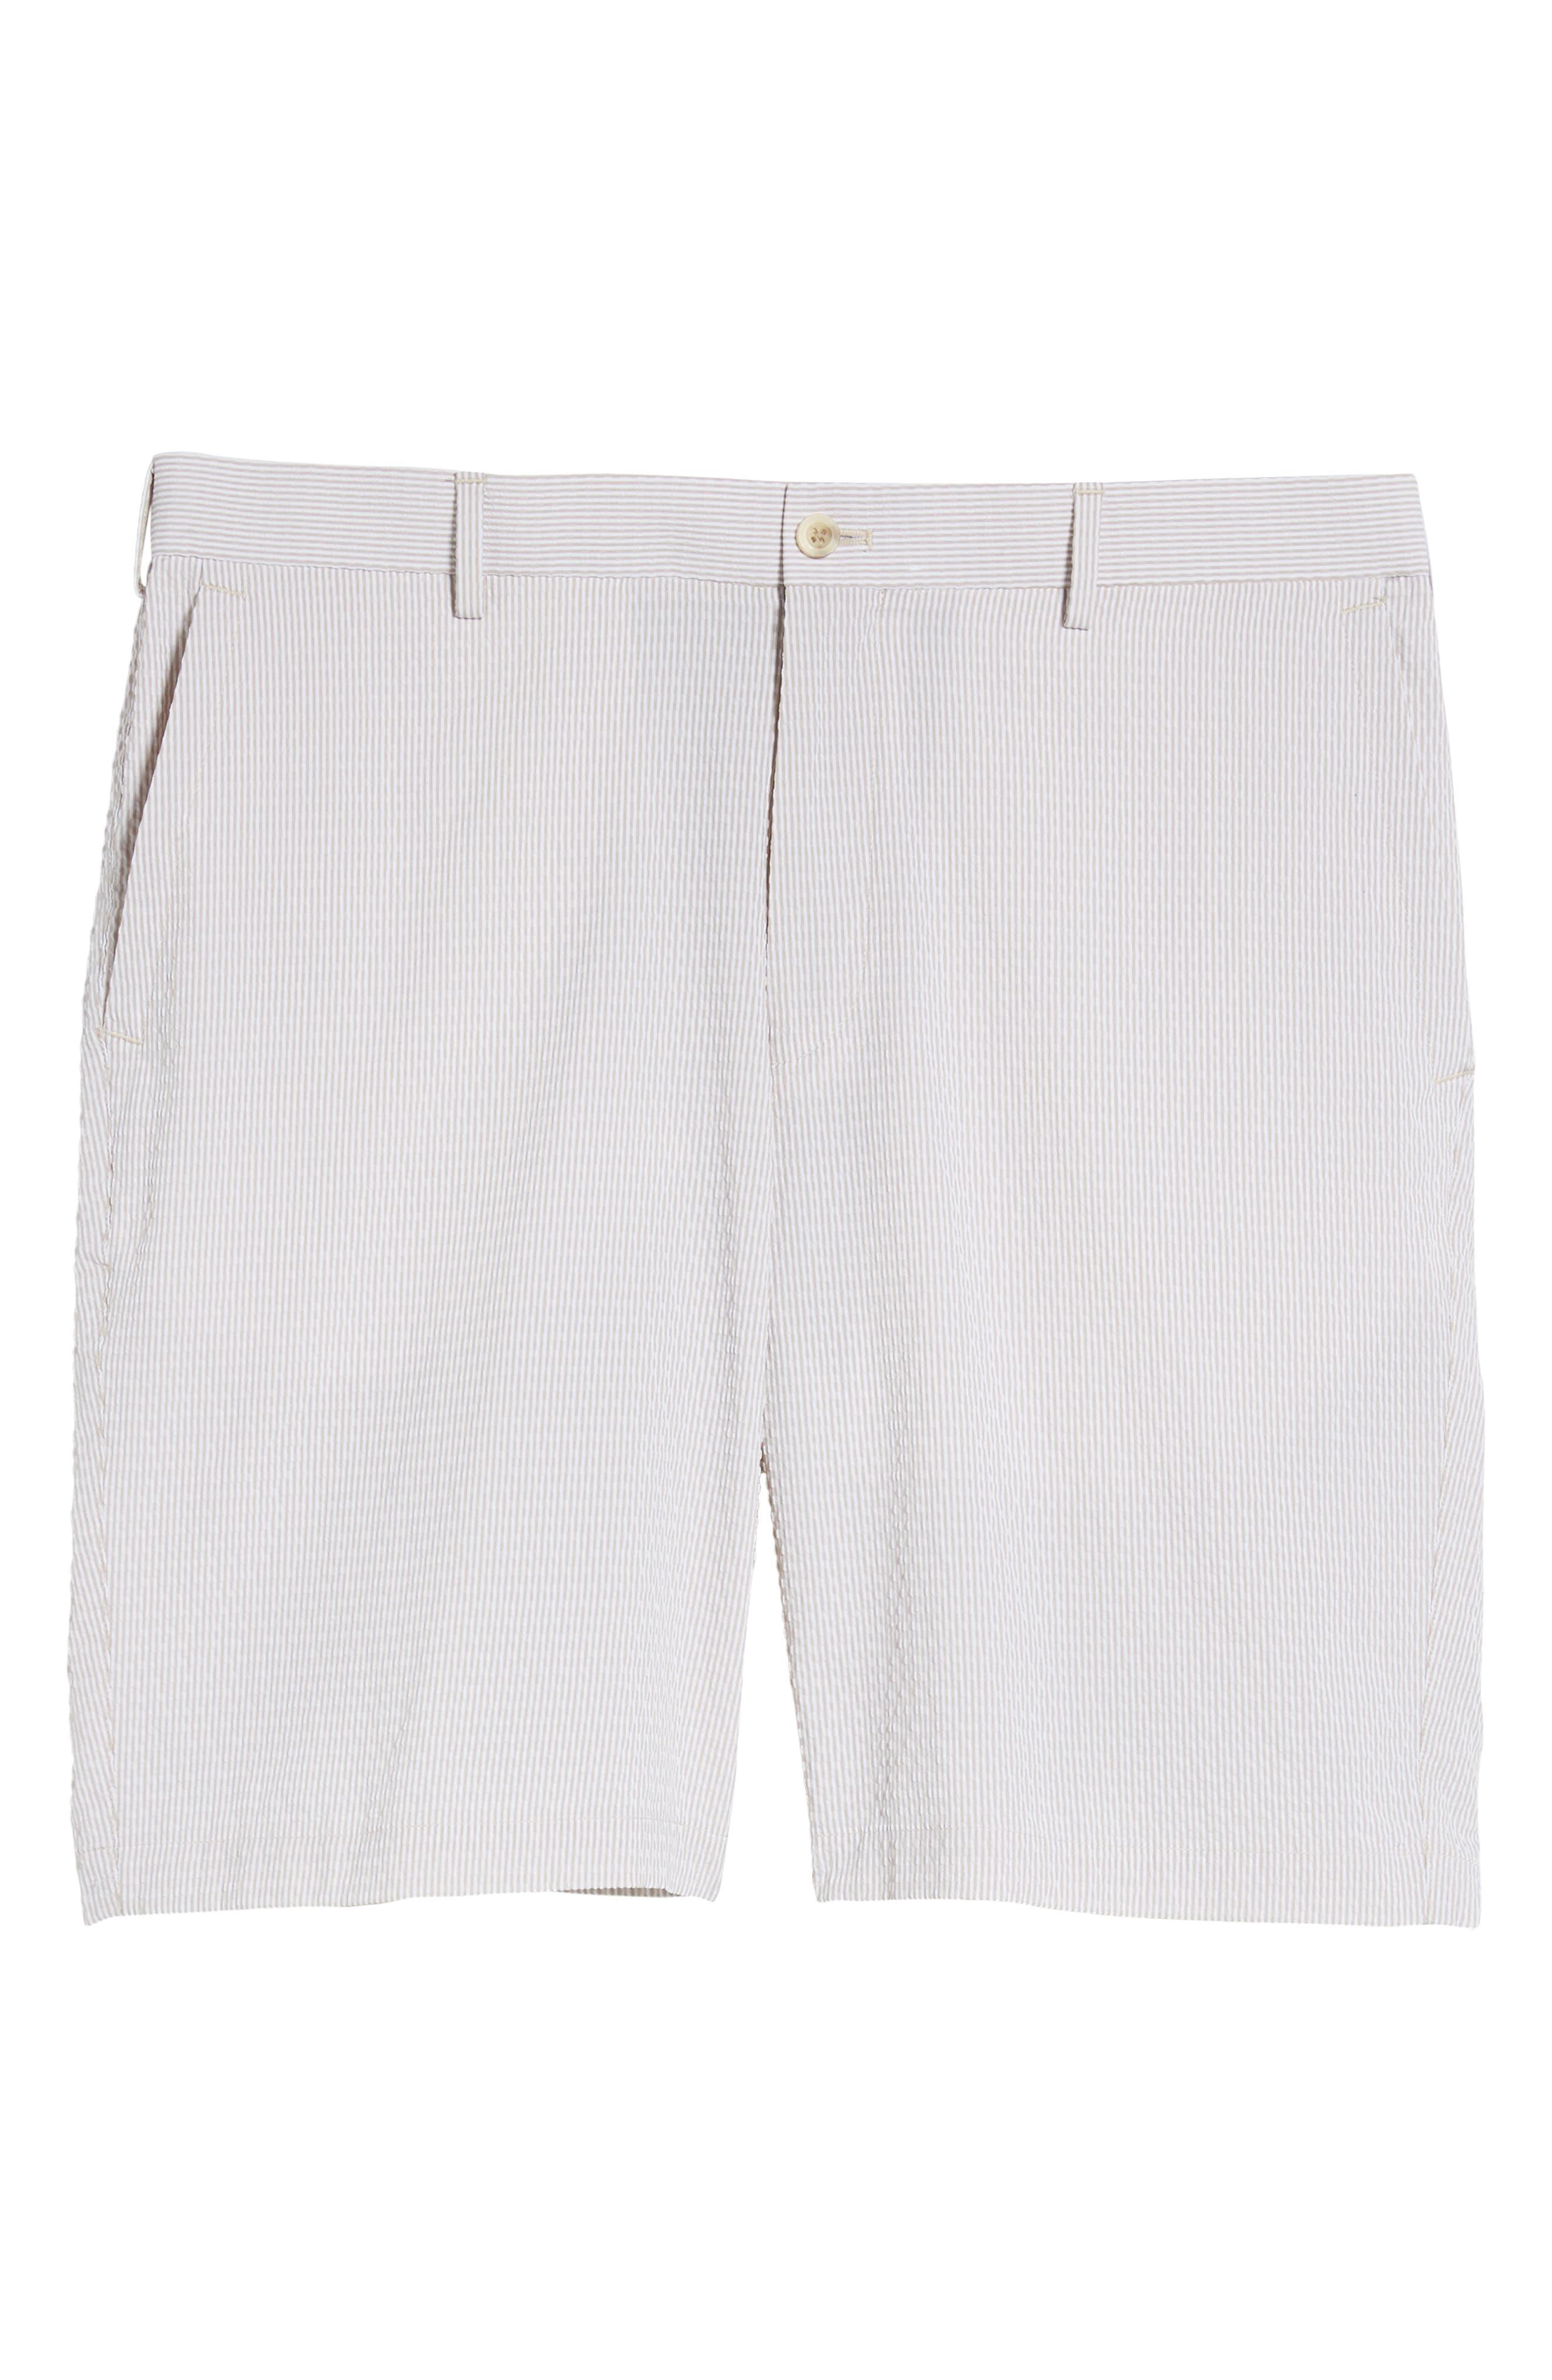 Apex Pinstripe Seersucker Shorts,                             Alternate thumbnail 6, color,                             Khaki